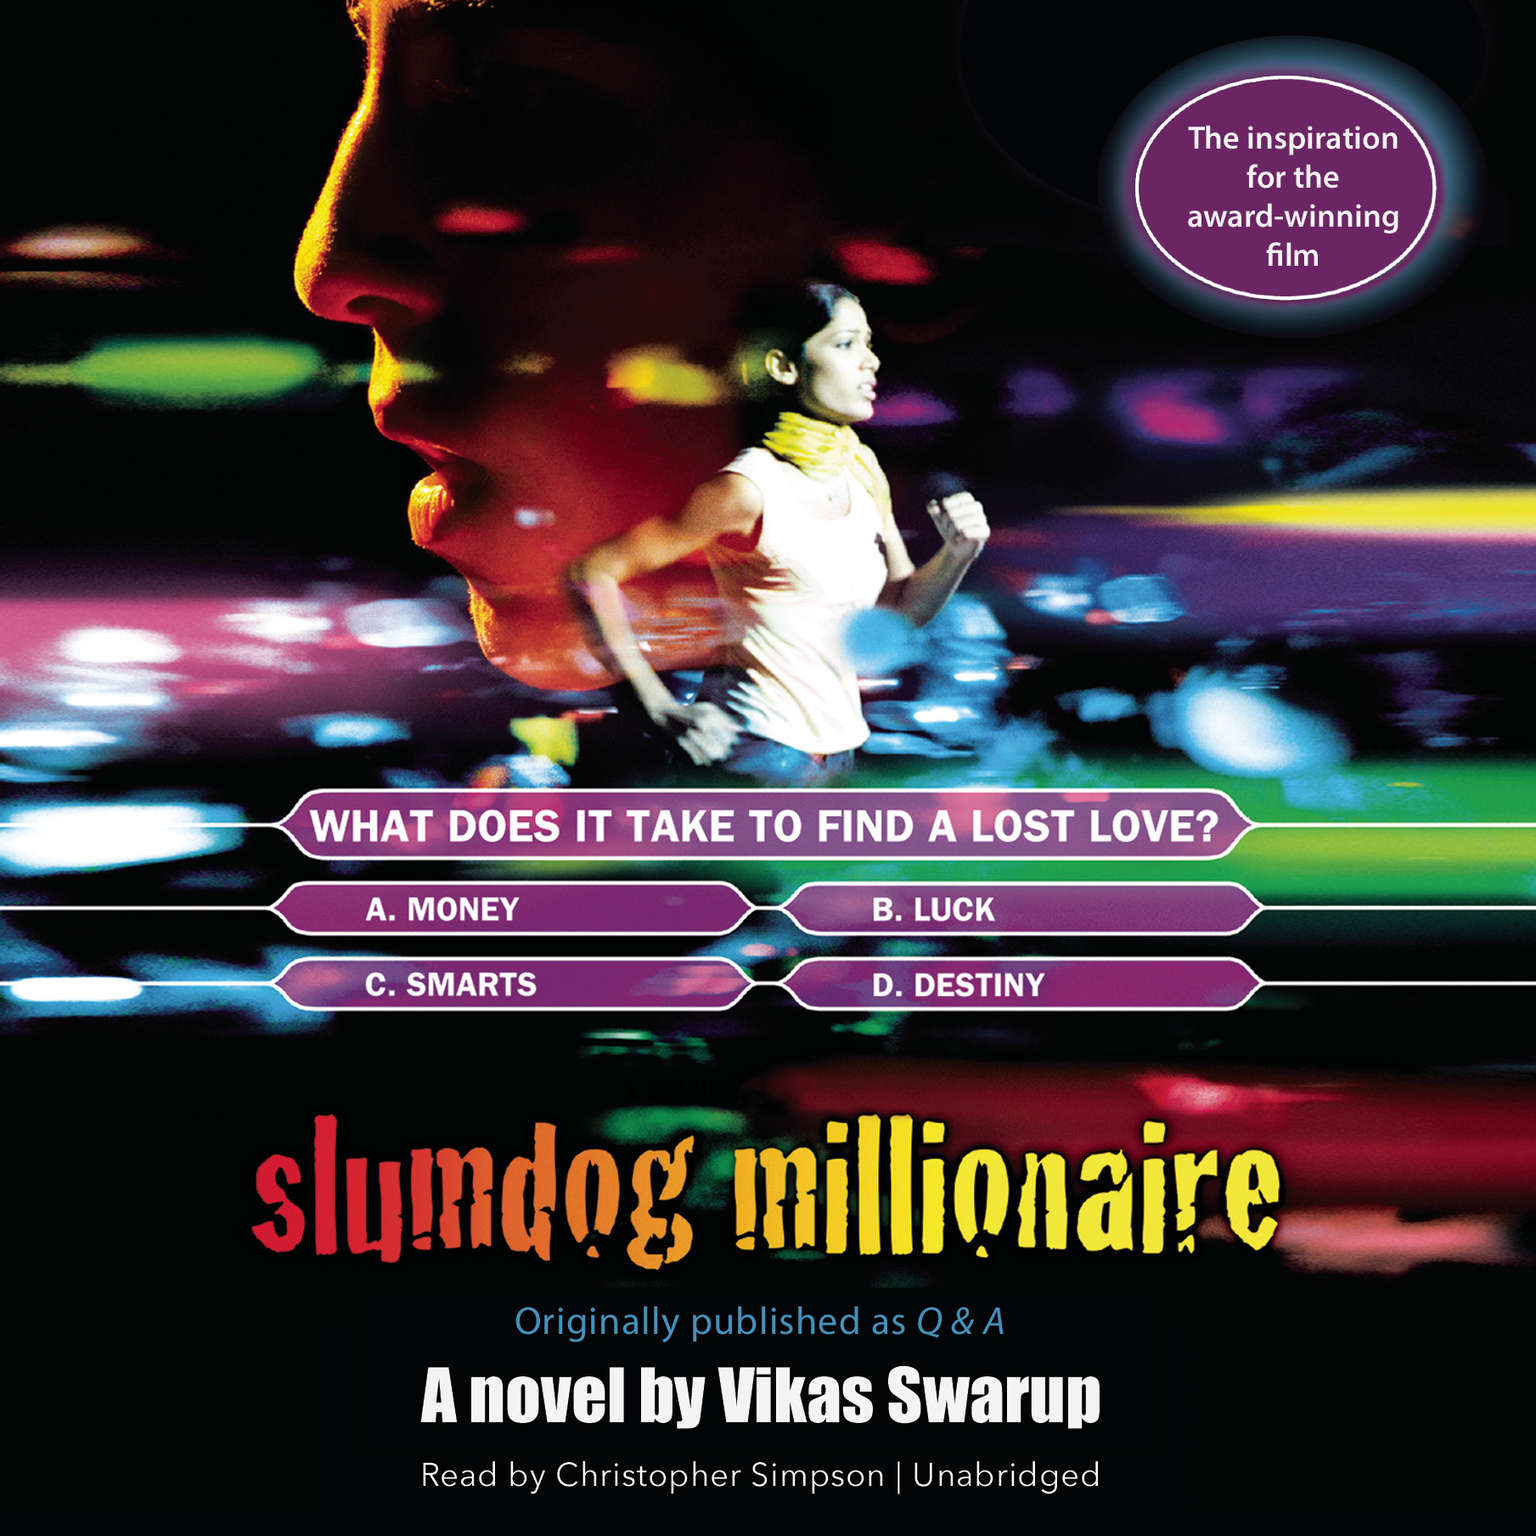 Slumdog Millionaire: Originally published as Q & A Audiobook, by Vikas Swarup